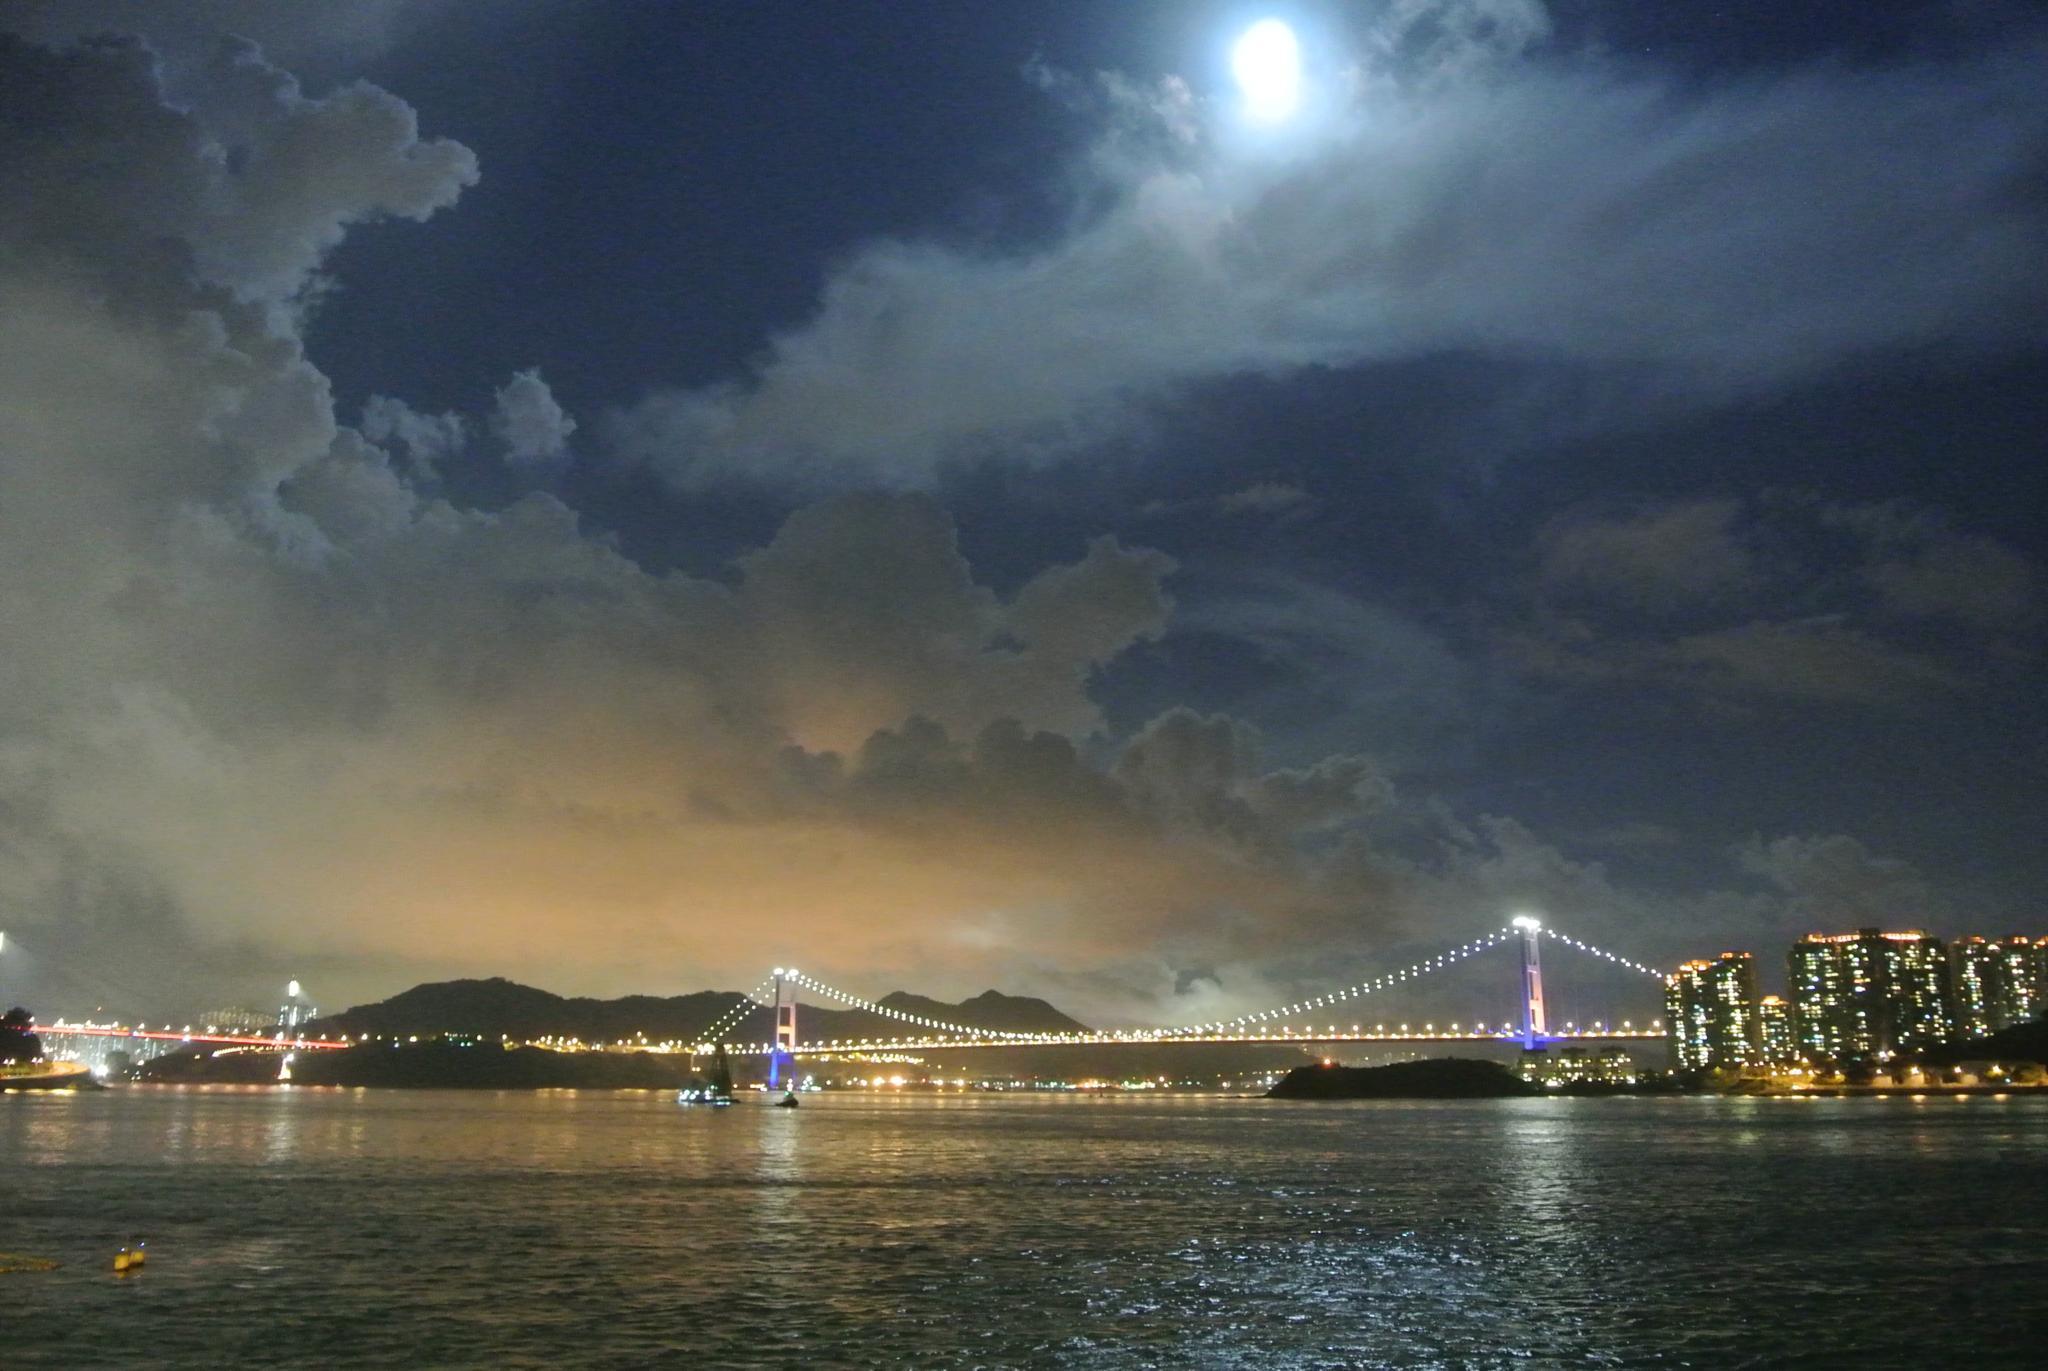 Tsing Ma & Ting Kau Bridge by Donald Wong